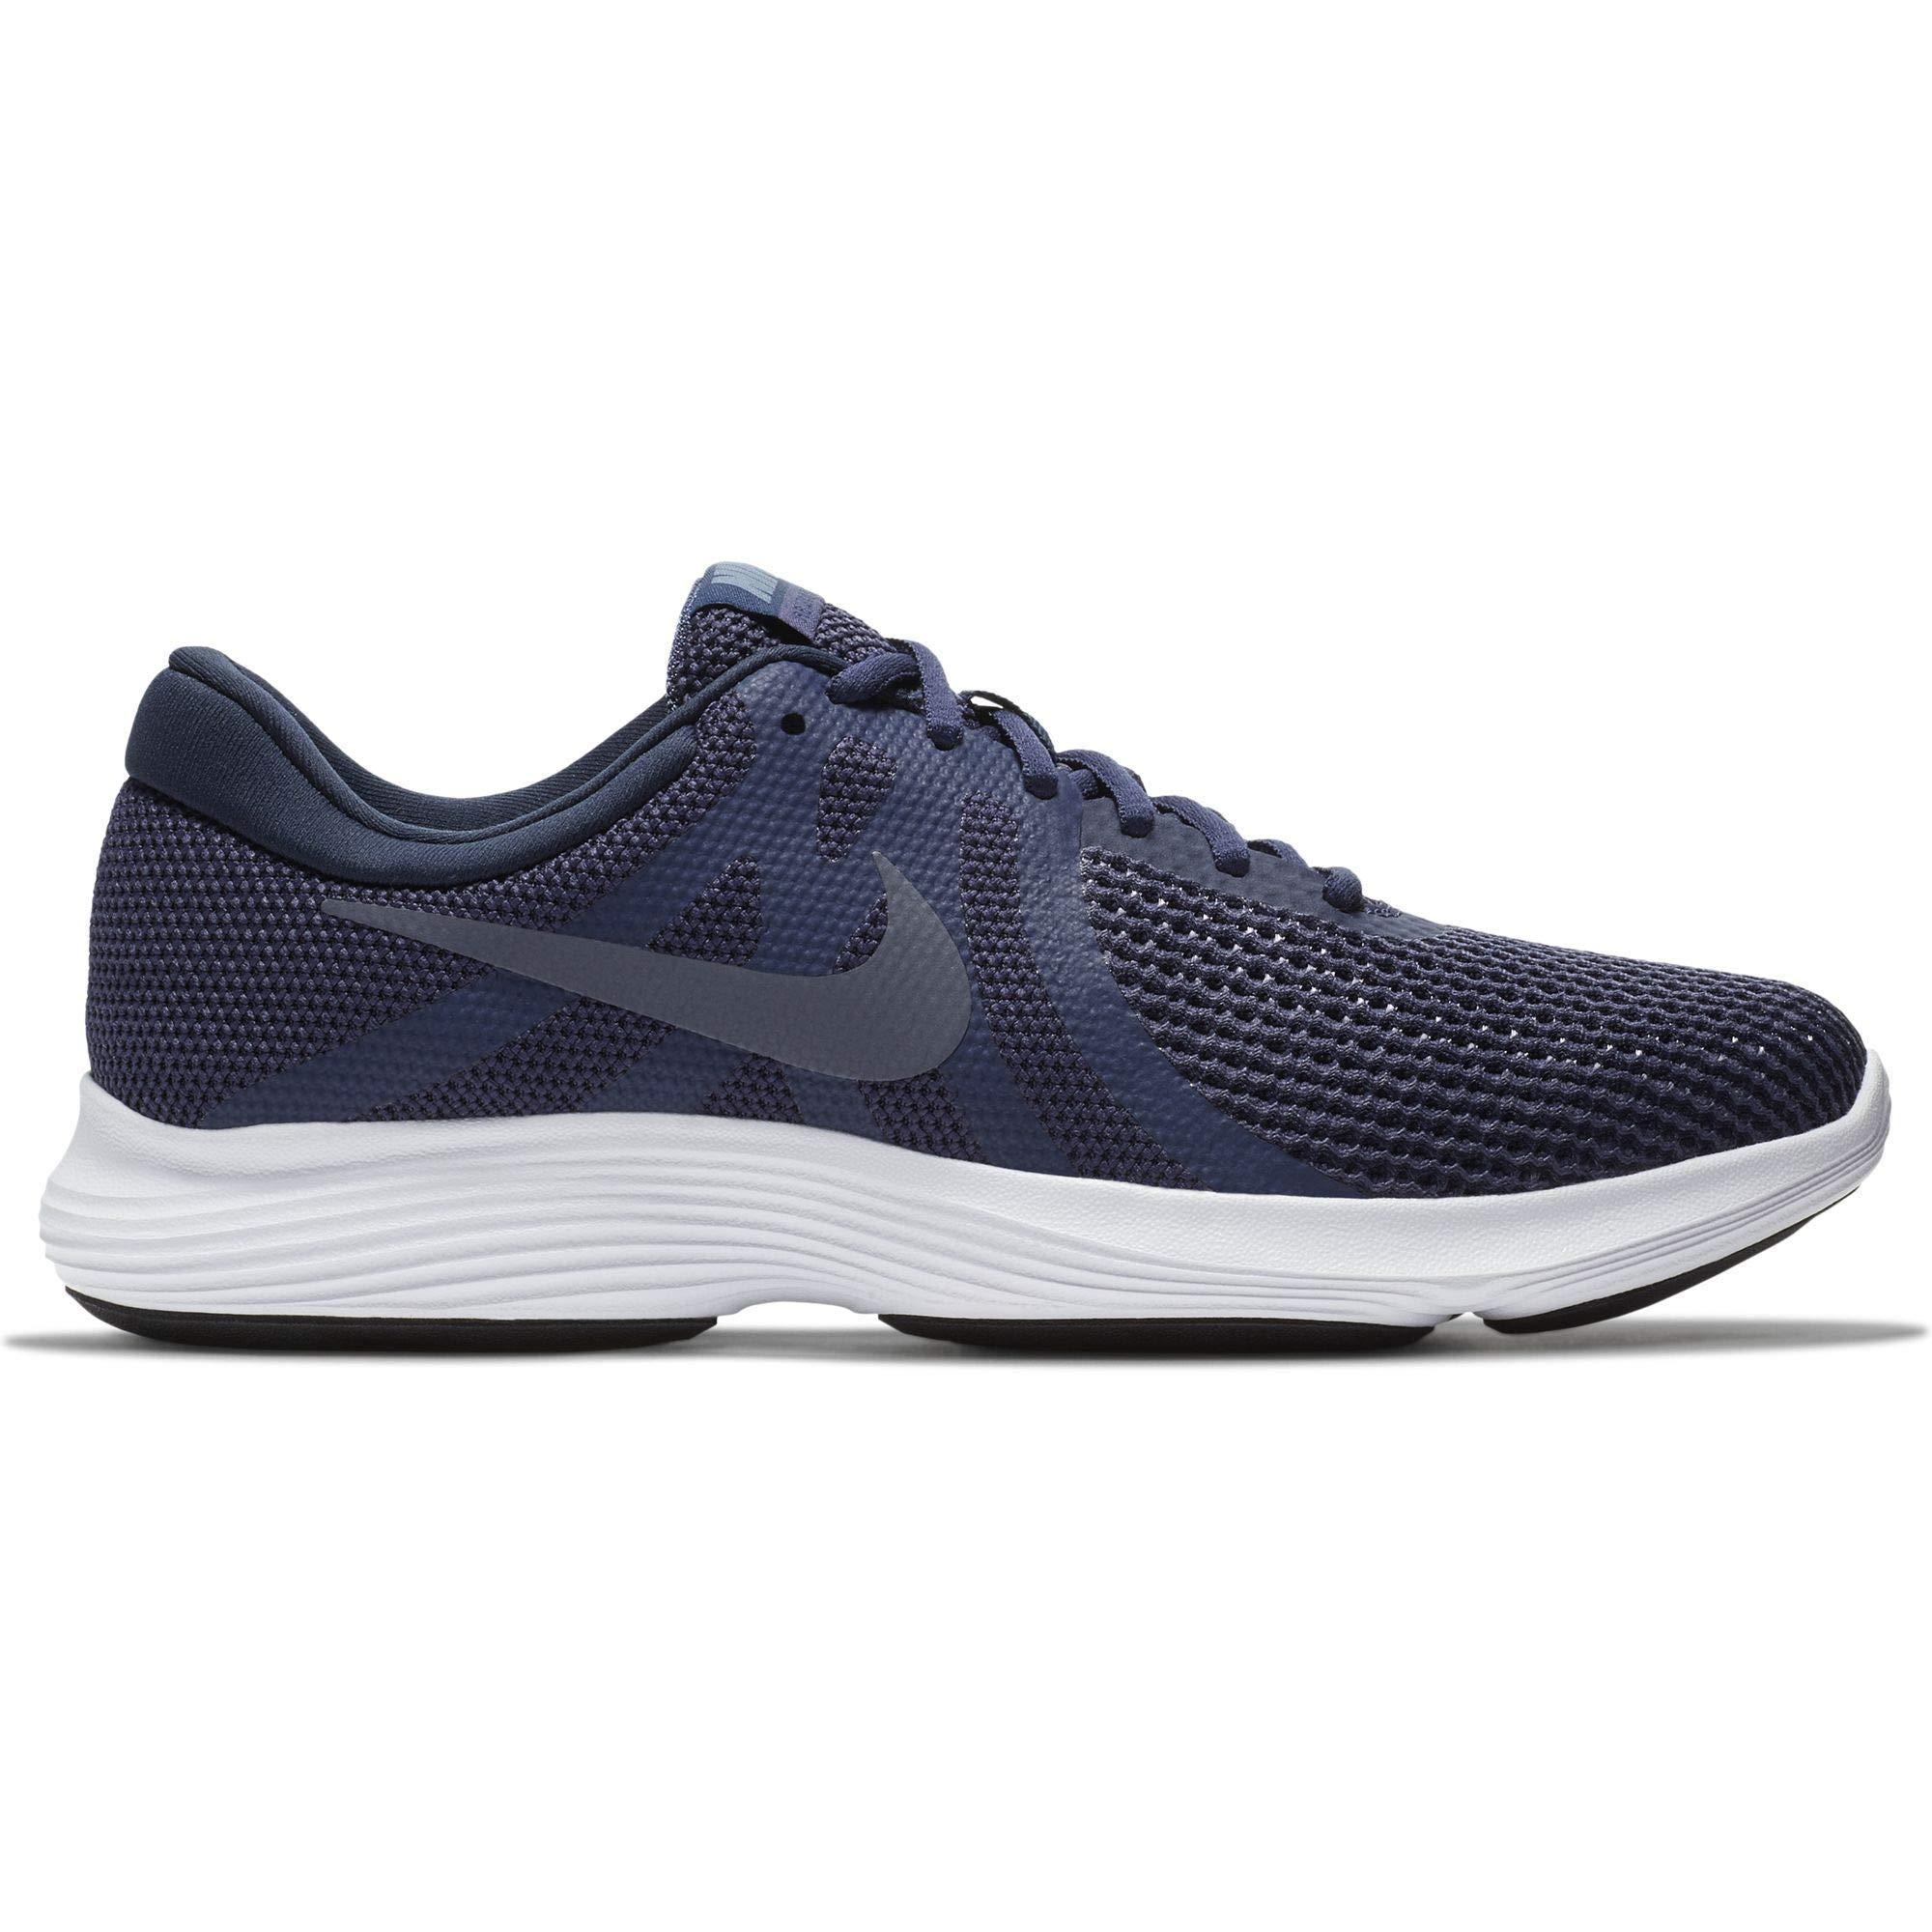 0903010231556 Galleon - Nike Men s Revolution 4 Running Shoe Neutral Indigo Light  Carbon Obsidian Size 11 M US